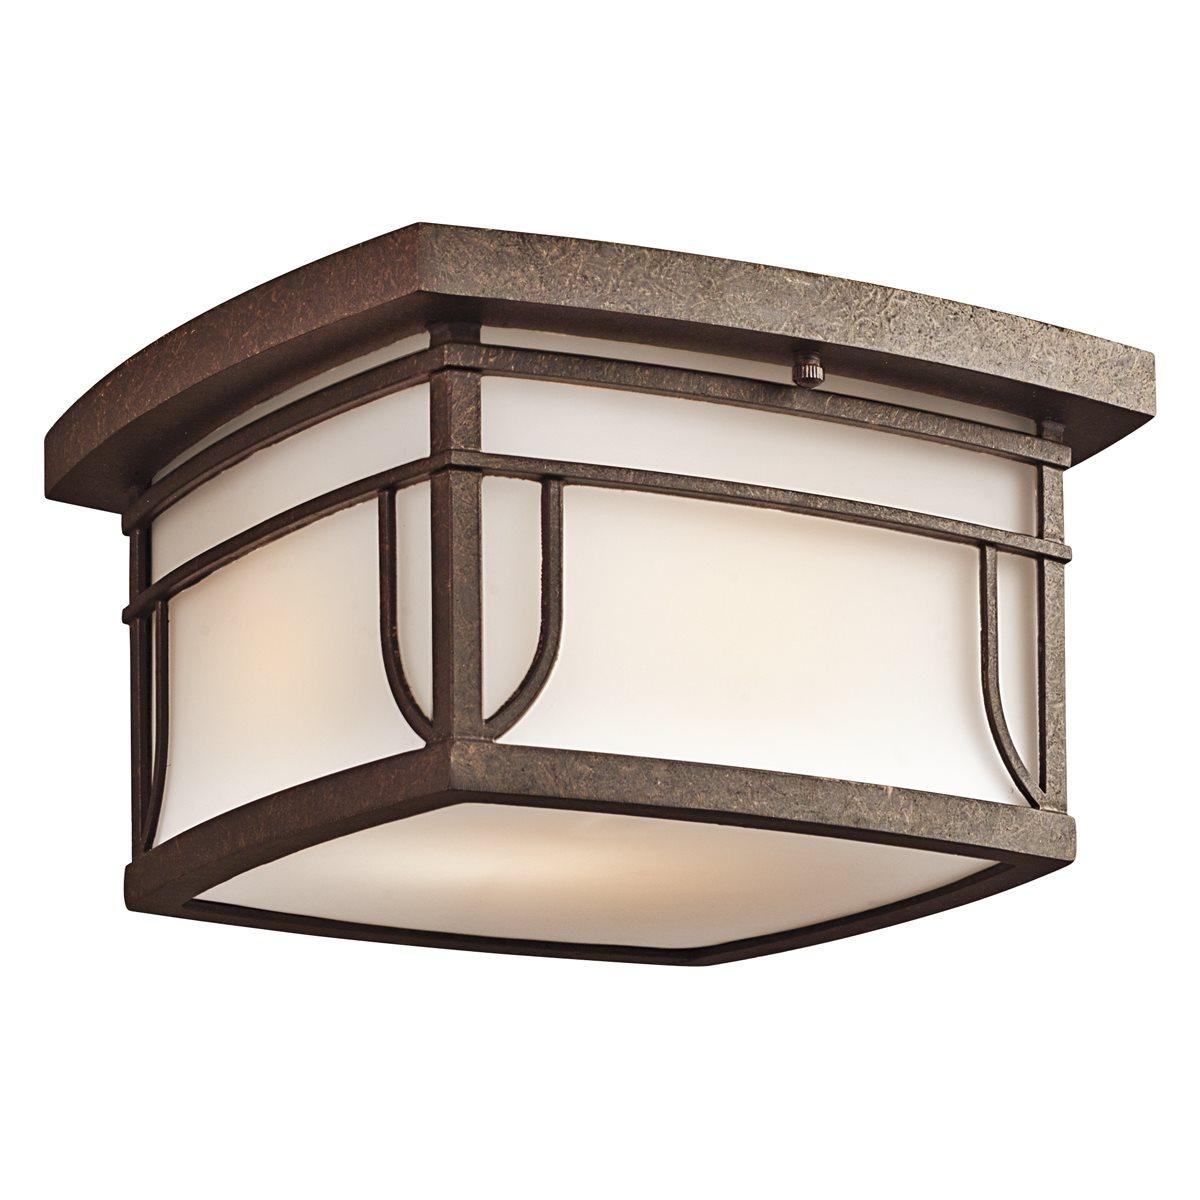 Kichler Lighting 49153agzs Priya Transitional Outdoor Flush Mount Ceiling Light Kch 49153agzs